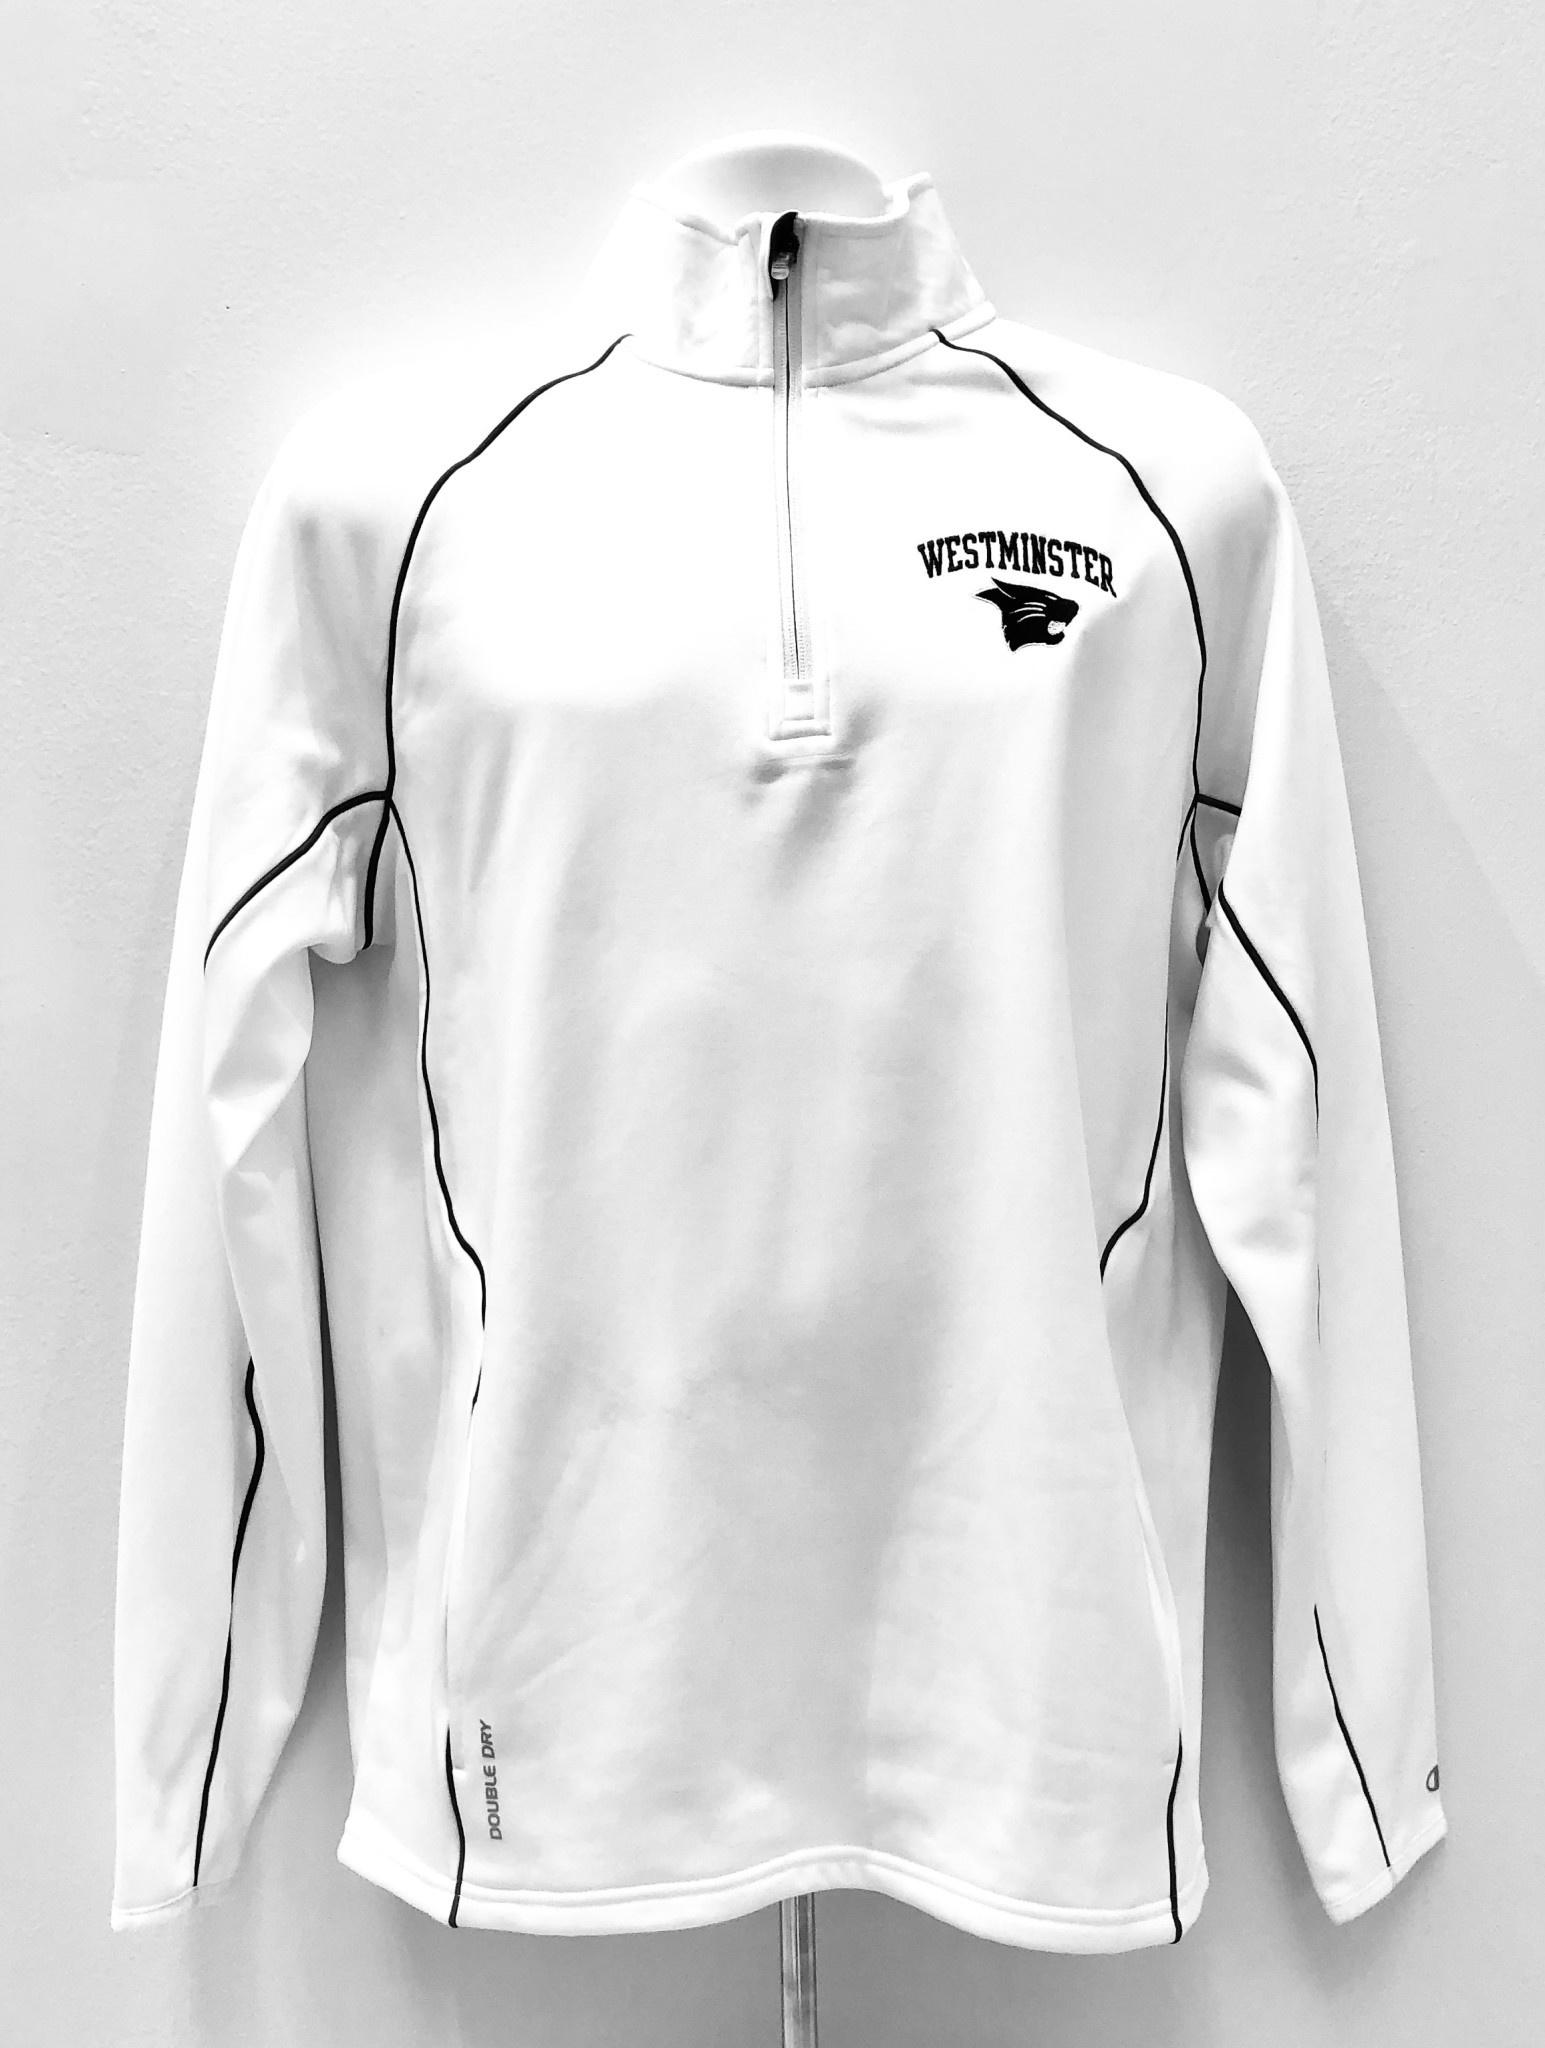 Champion Pullover: Champion 1/4 Zip - white w/gray piping